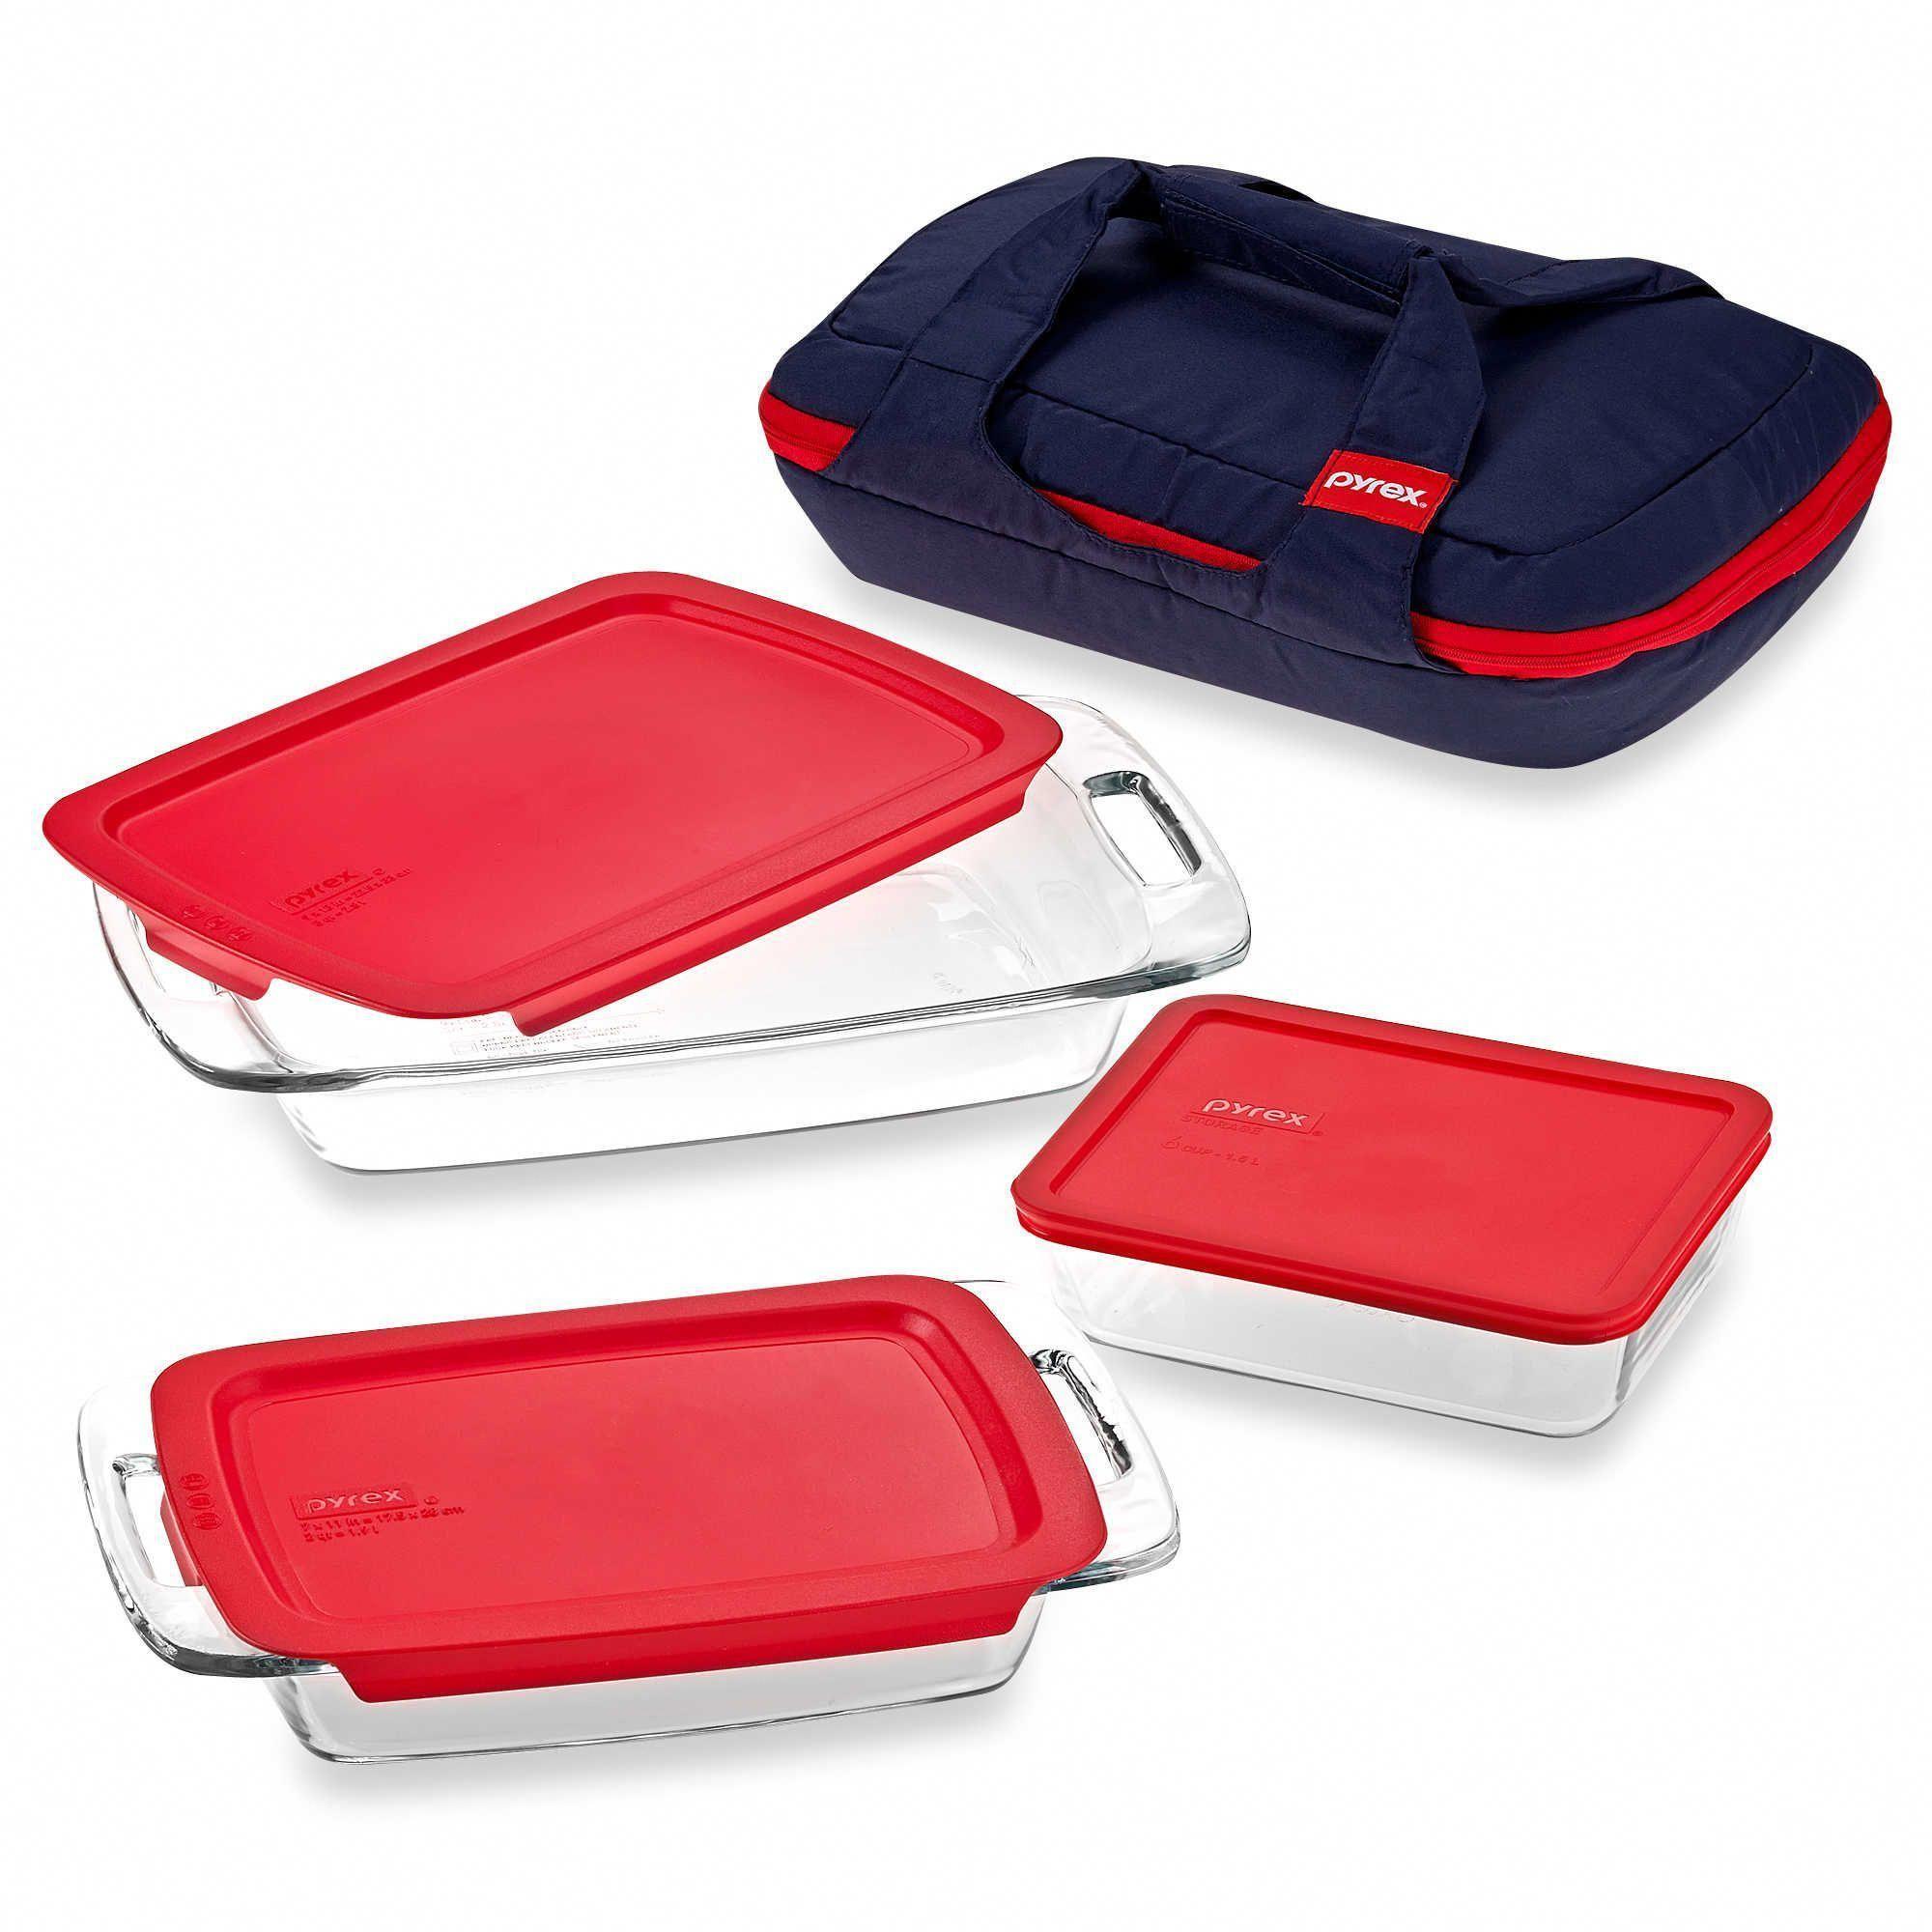 Pyrex Portables  Piece Bakeware Set Bakewareorganization